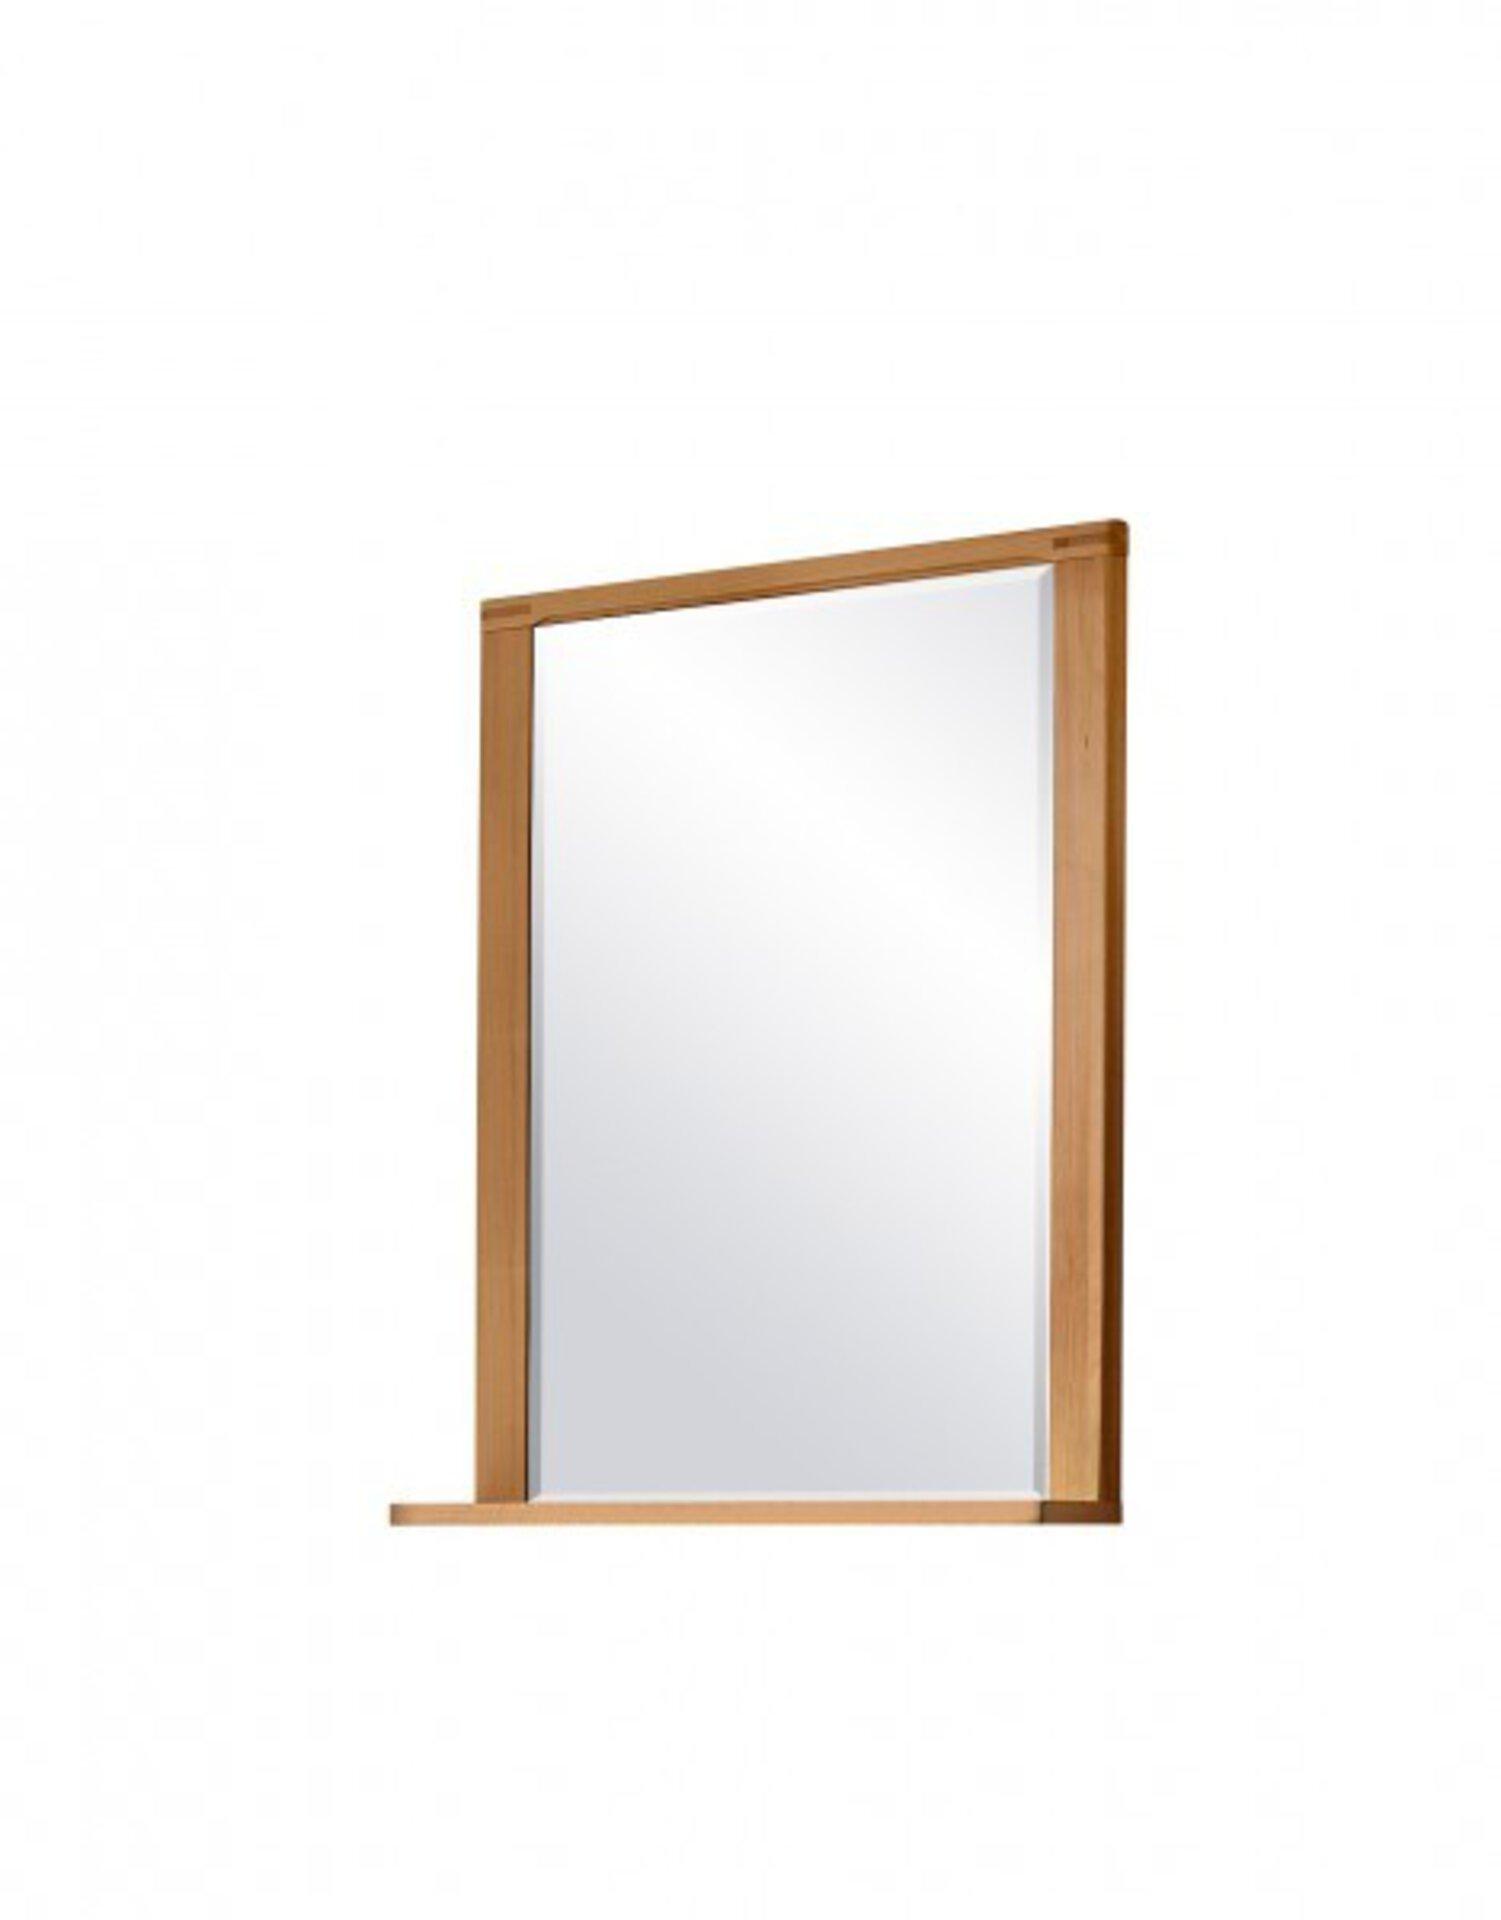 Spiegel NATURE PLUS inDoor Holz 15 x 93 x 74 cm